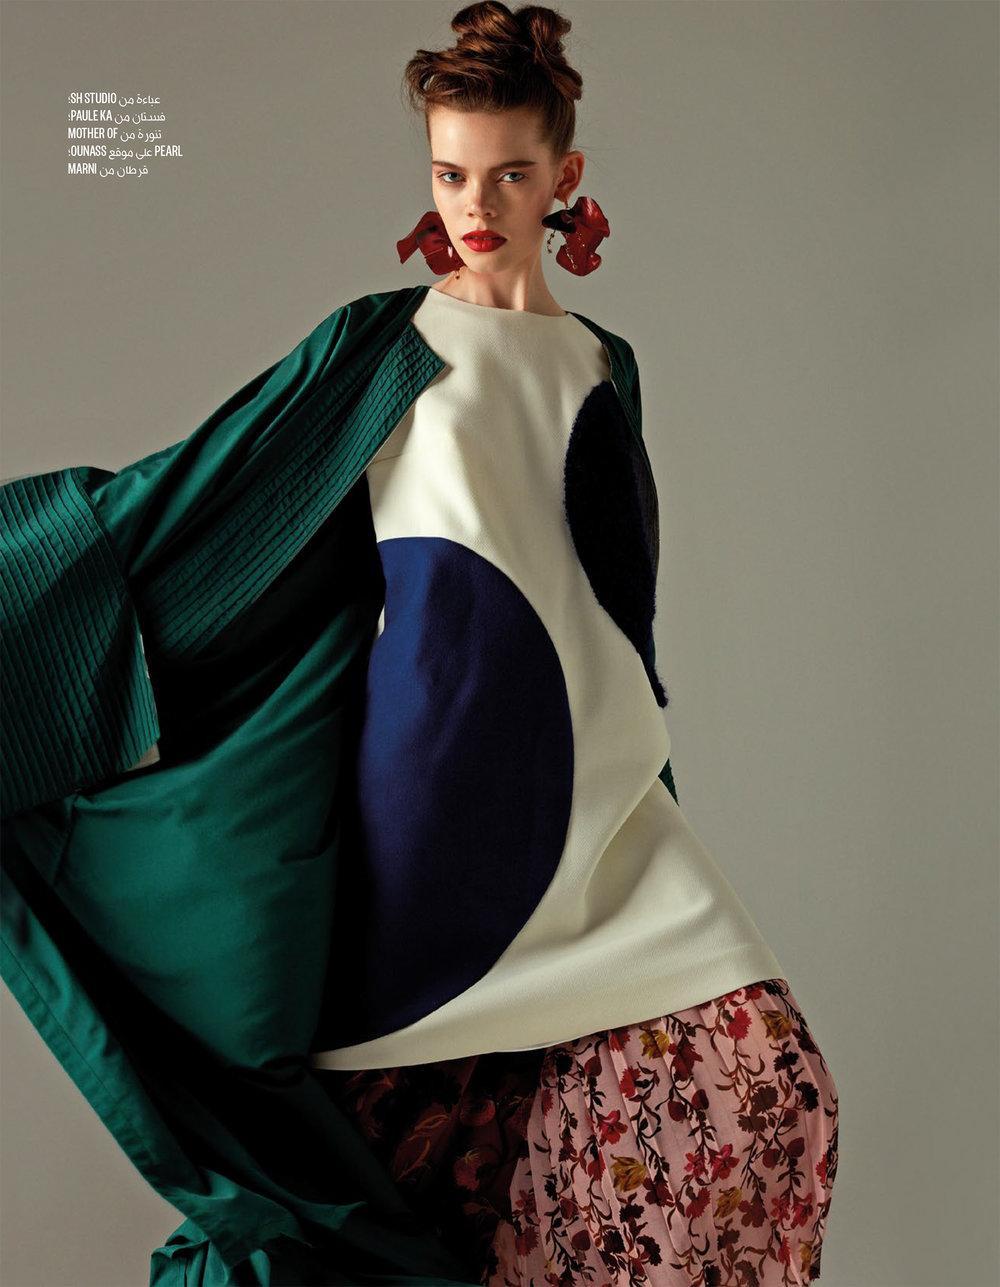 Vogue October Binder_Magzter (dragged)-6.jpg